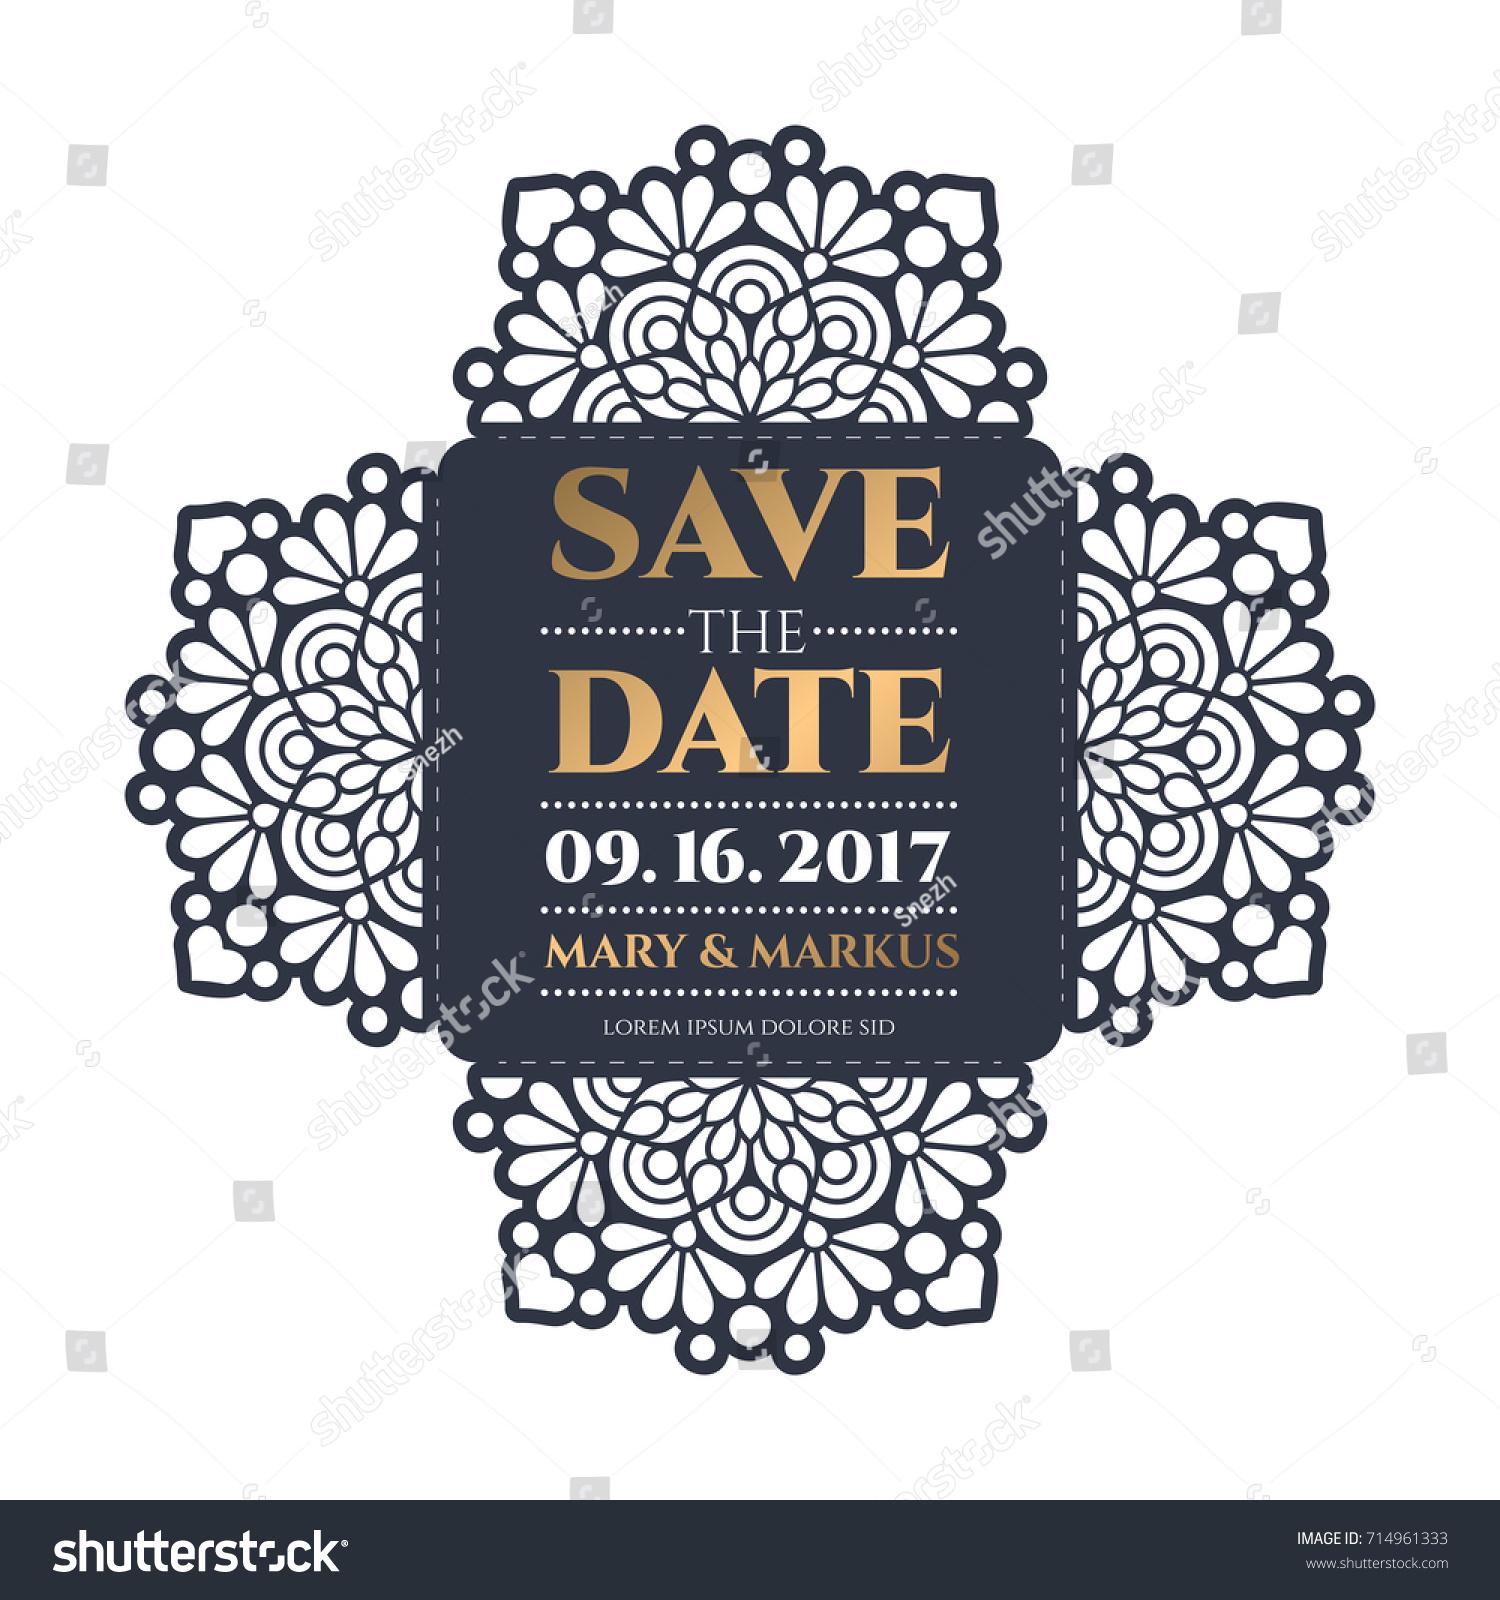 Vector Wedding Card Laser Cut Template Stock Vector (Royalty Free ...